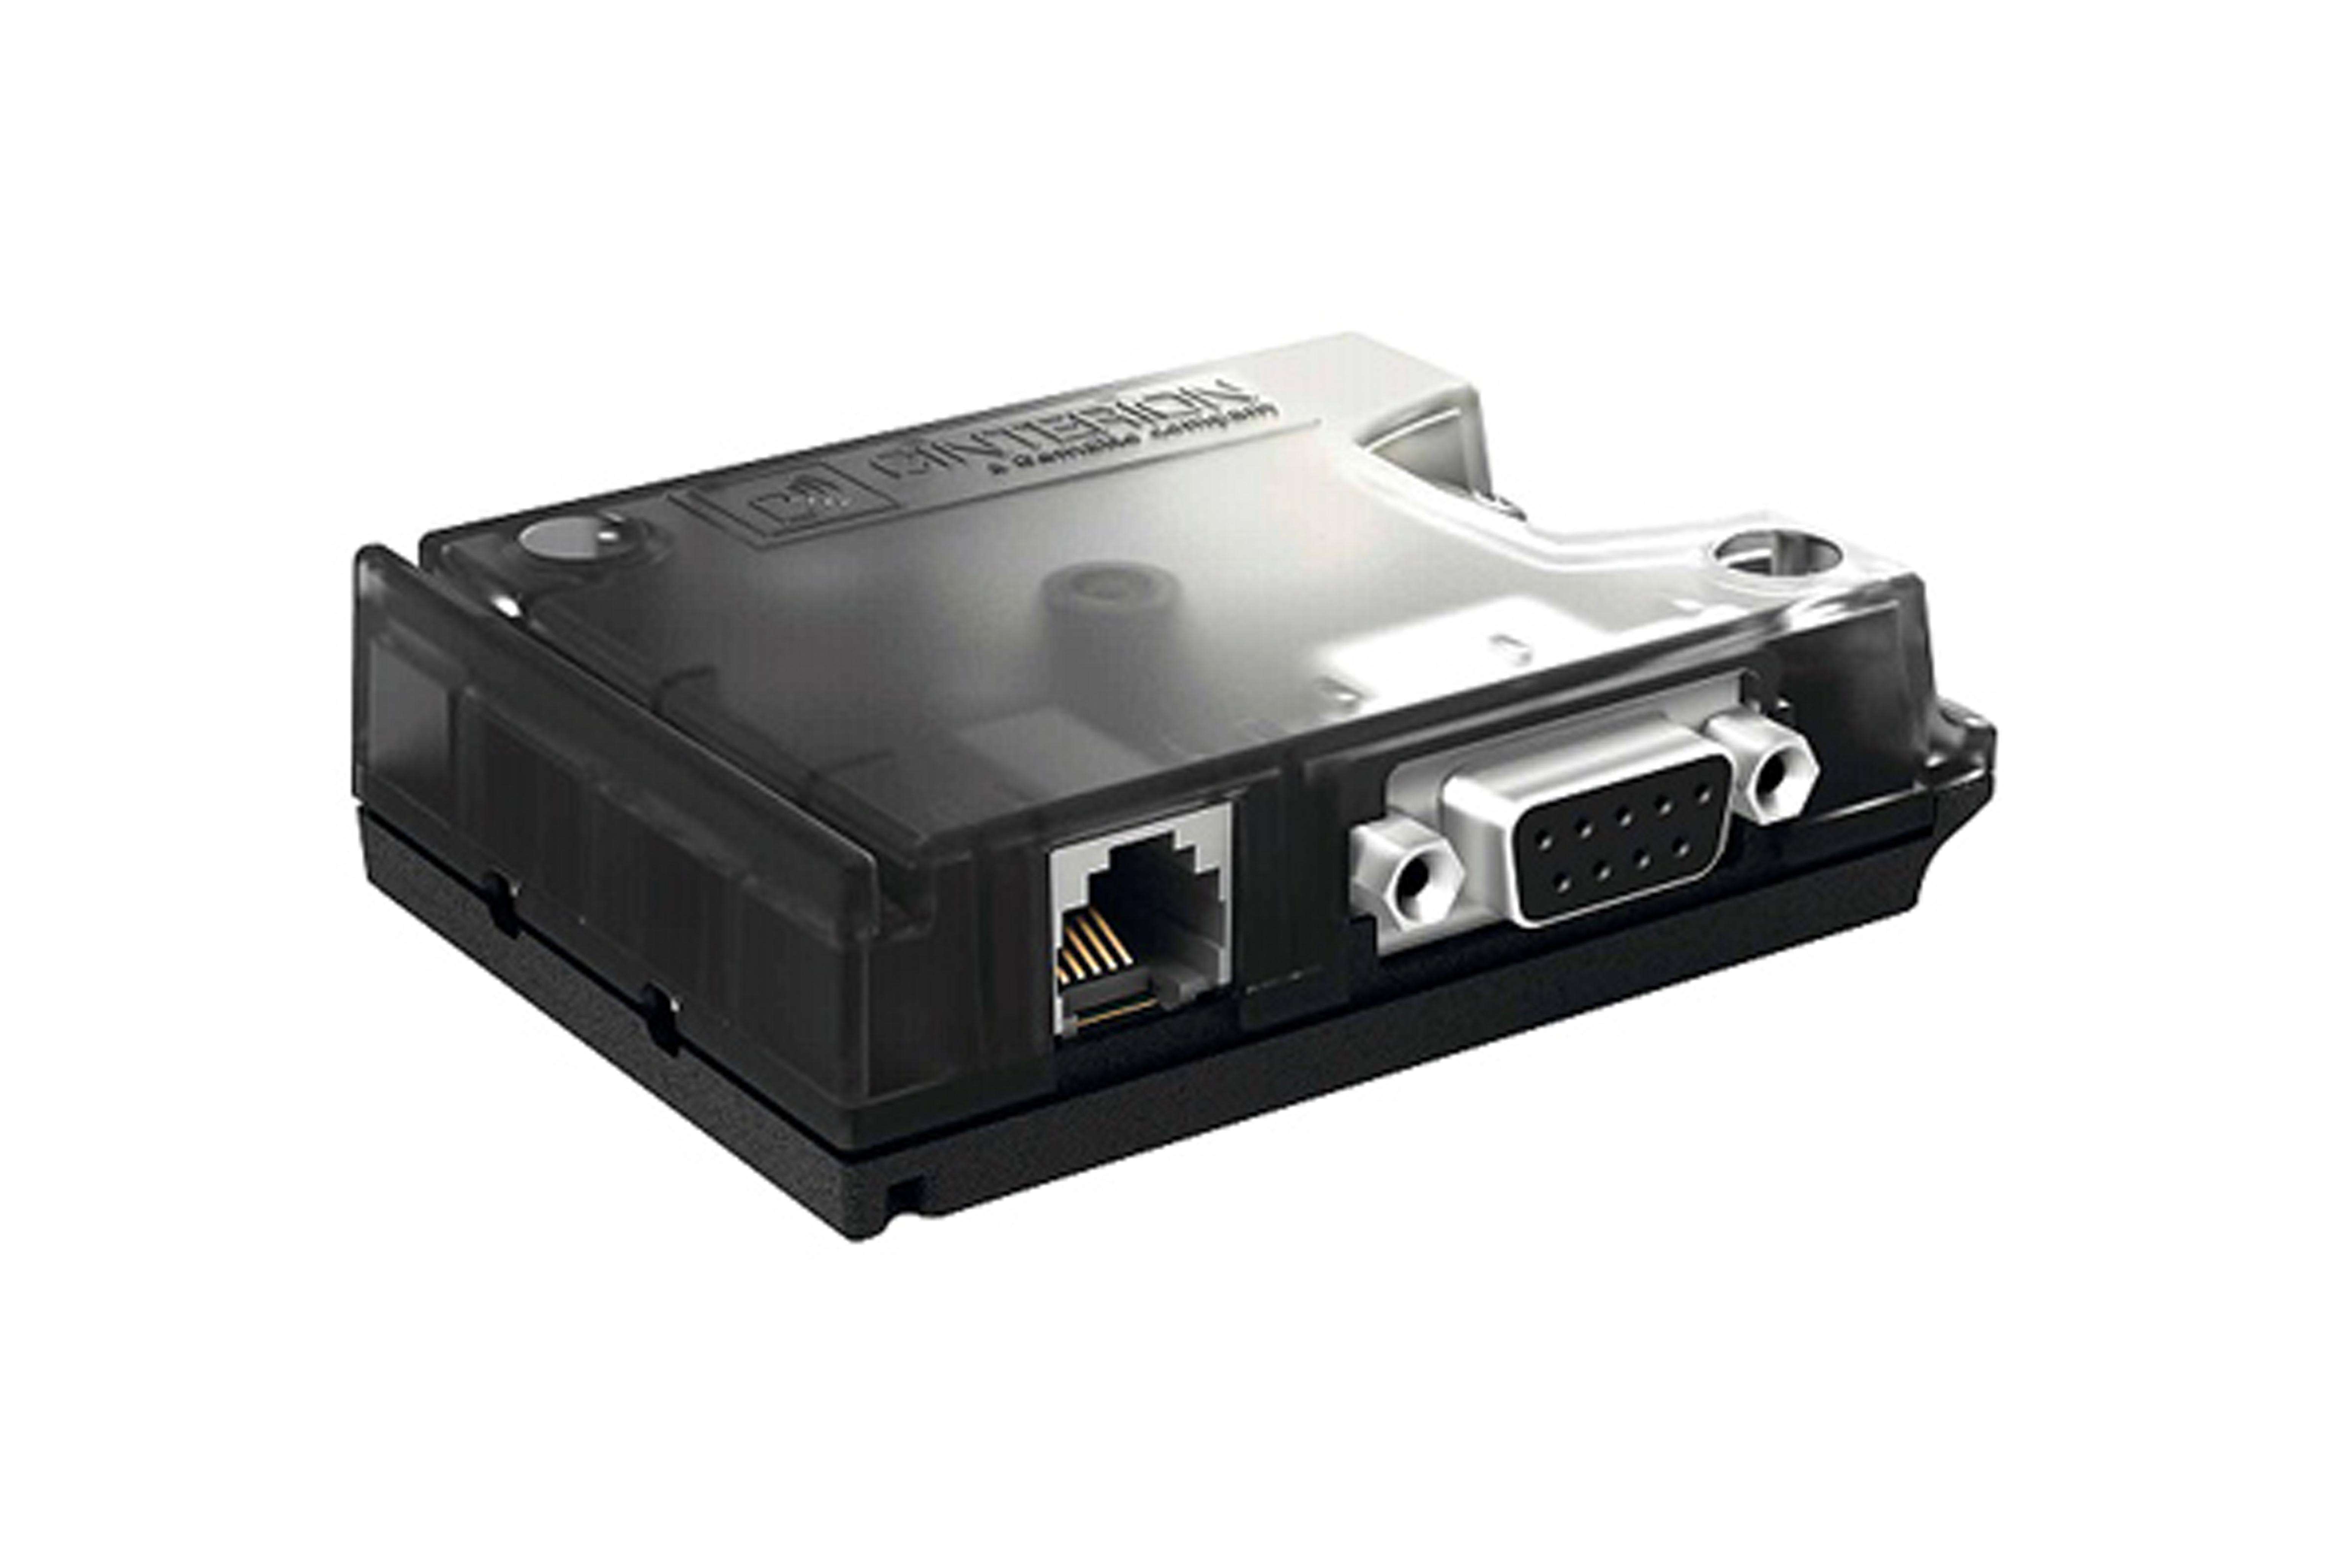 Cinterion GSM & GPRS-Modul, Pack B